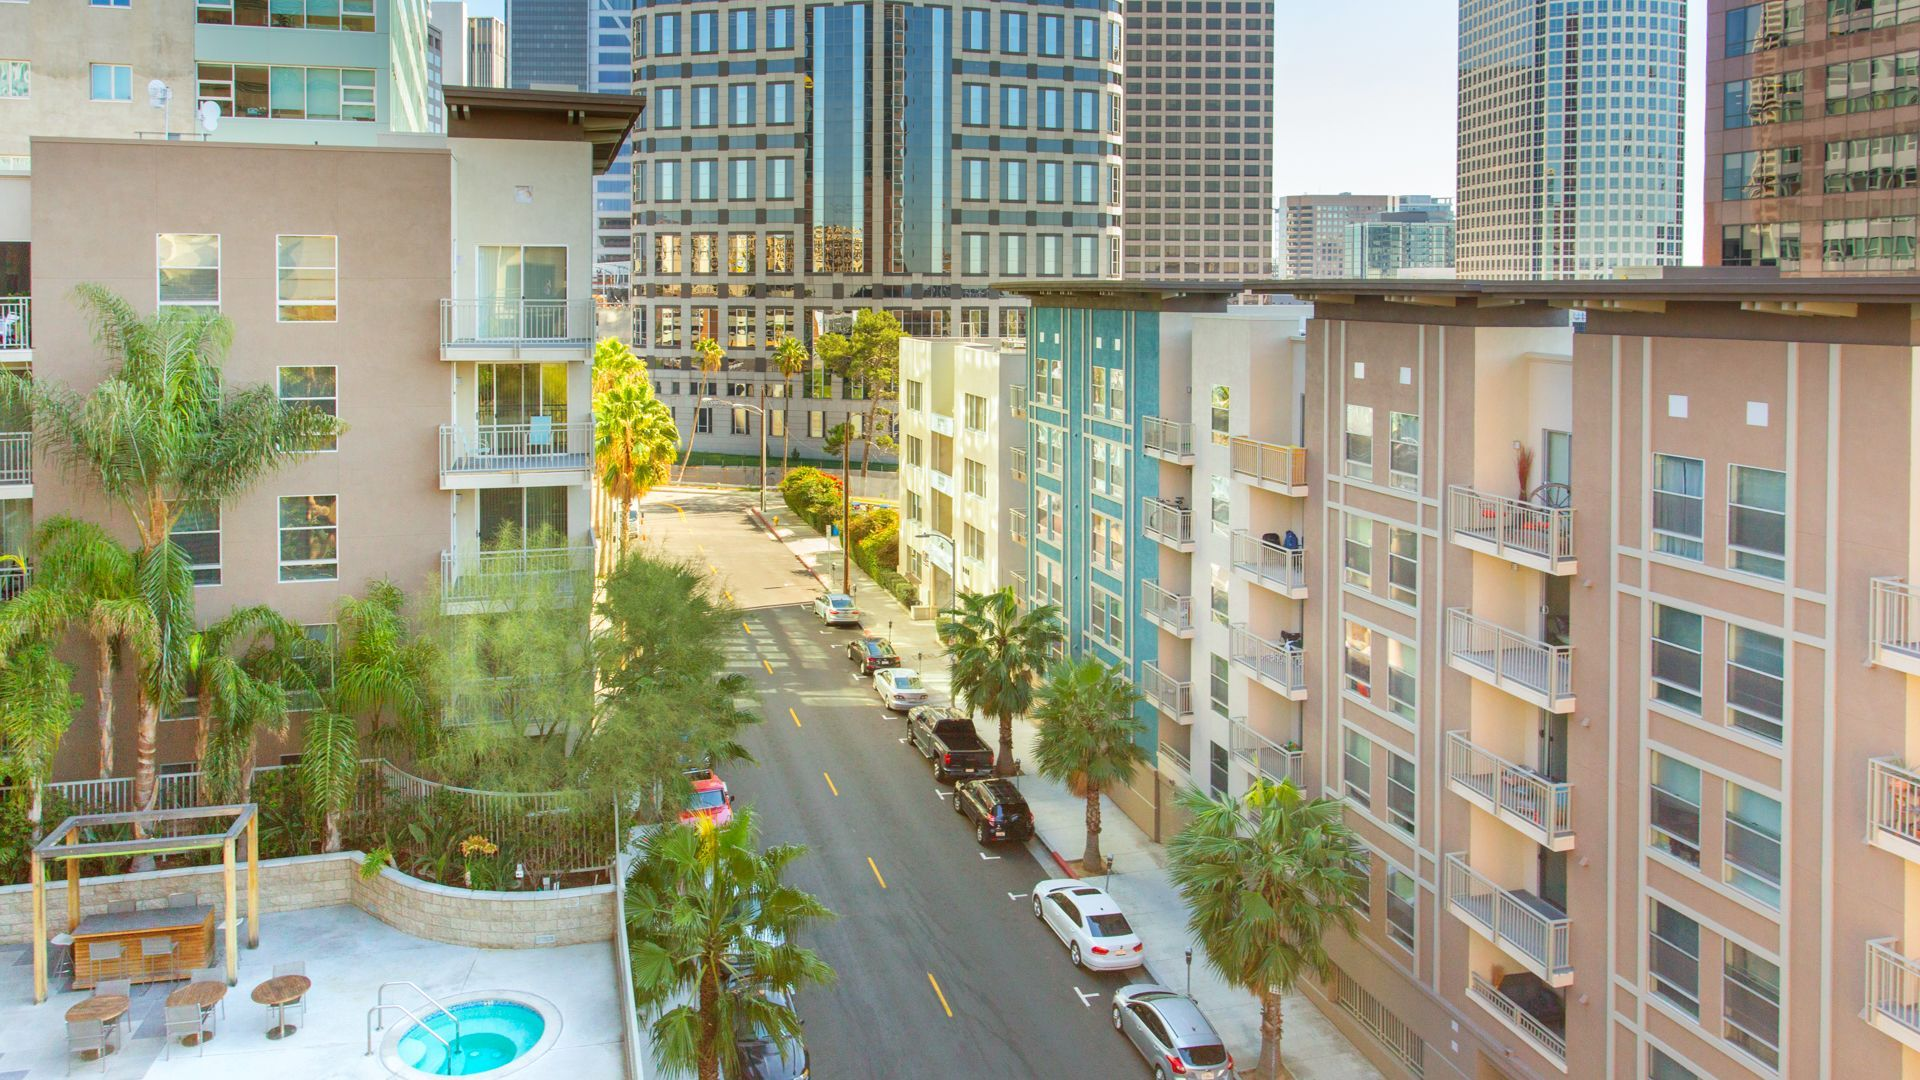 Glo Apartments Mid City Green Life Los Angeles